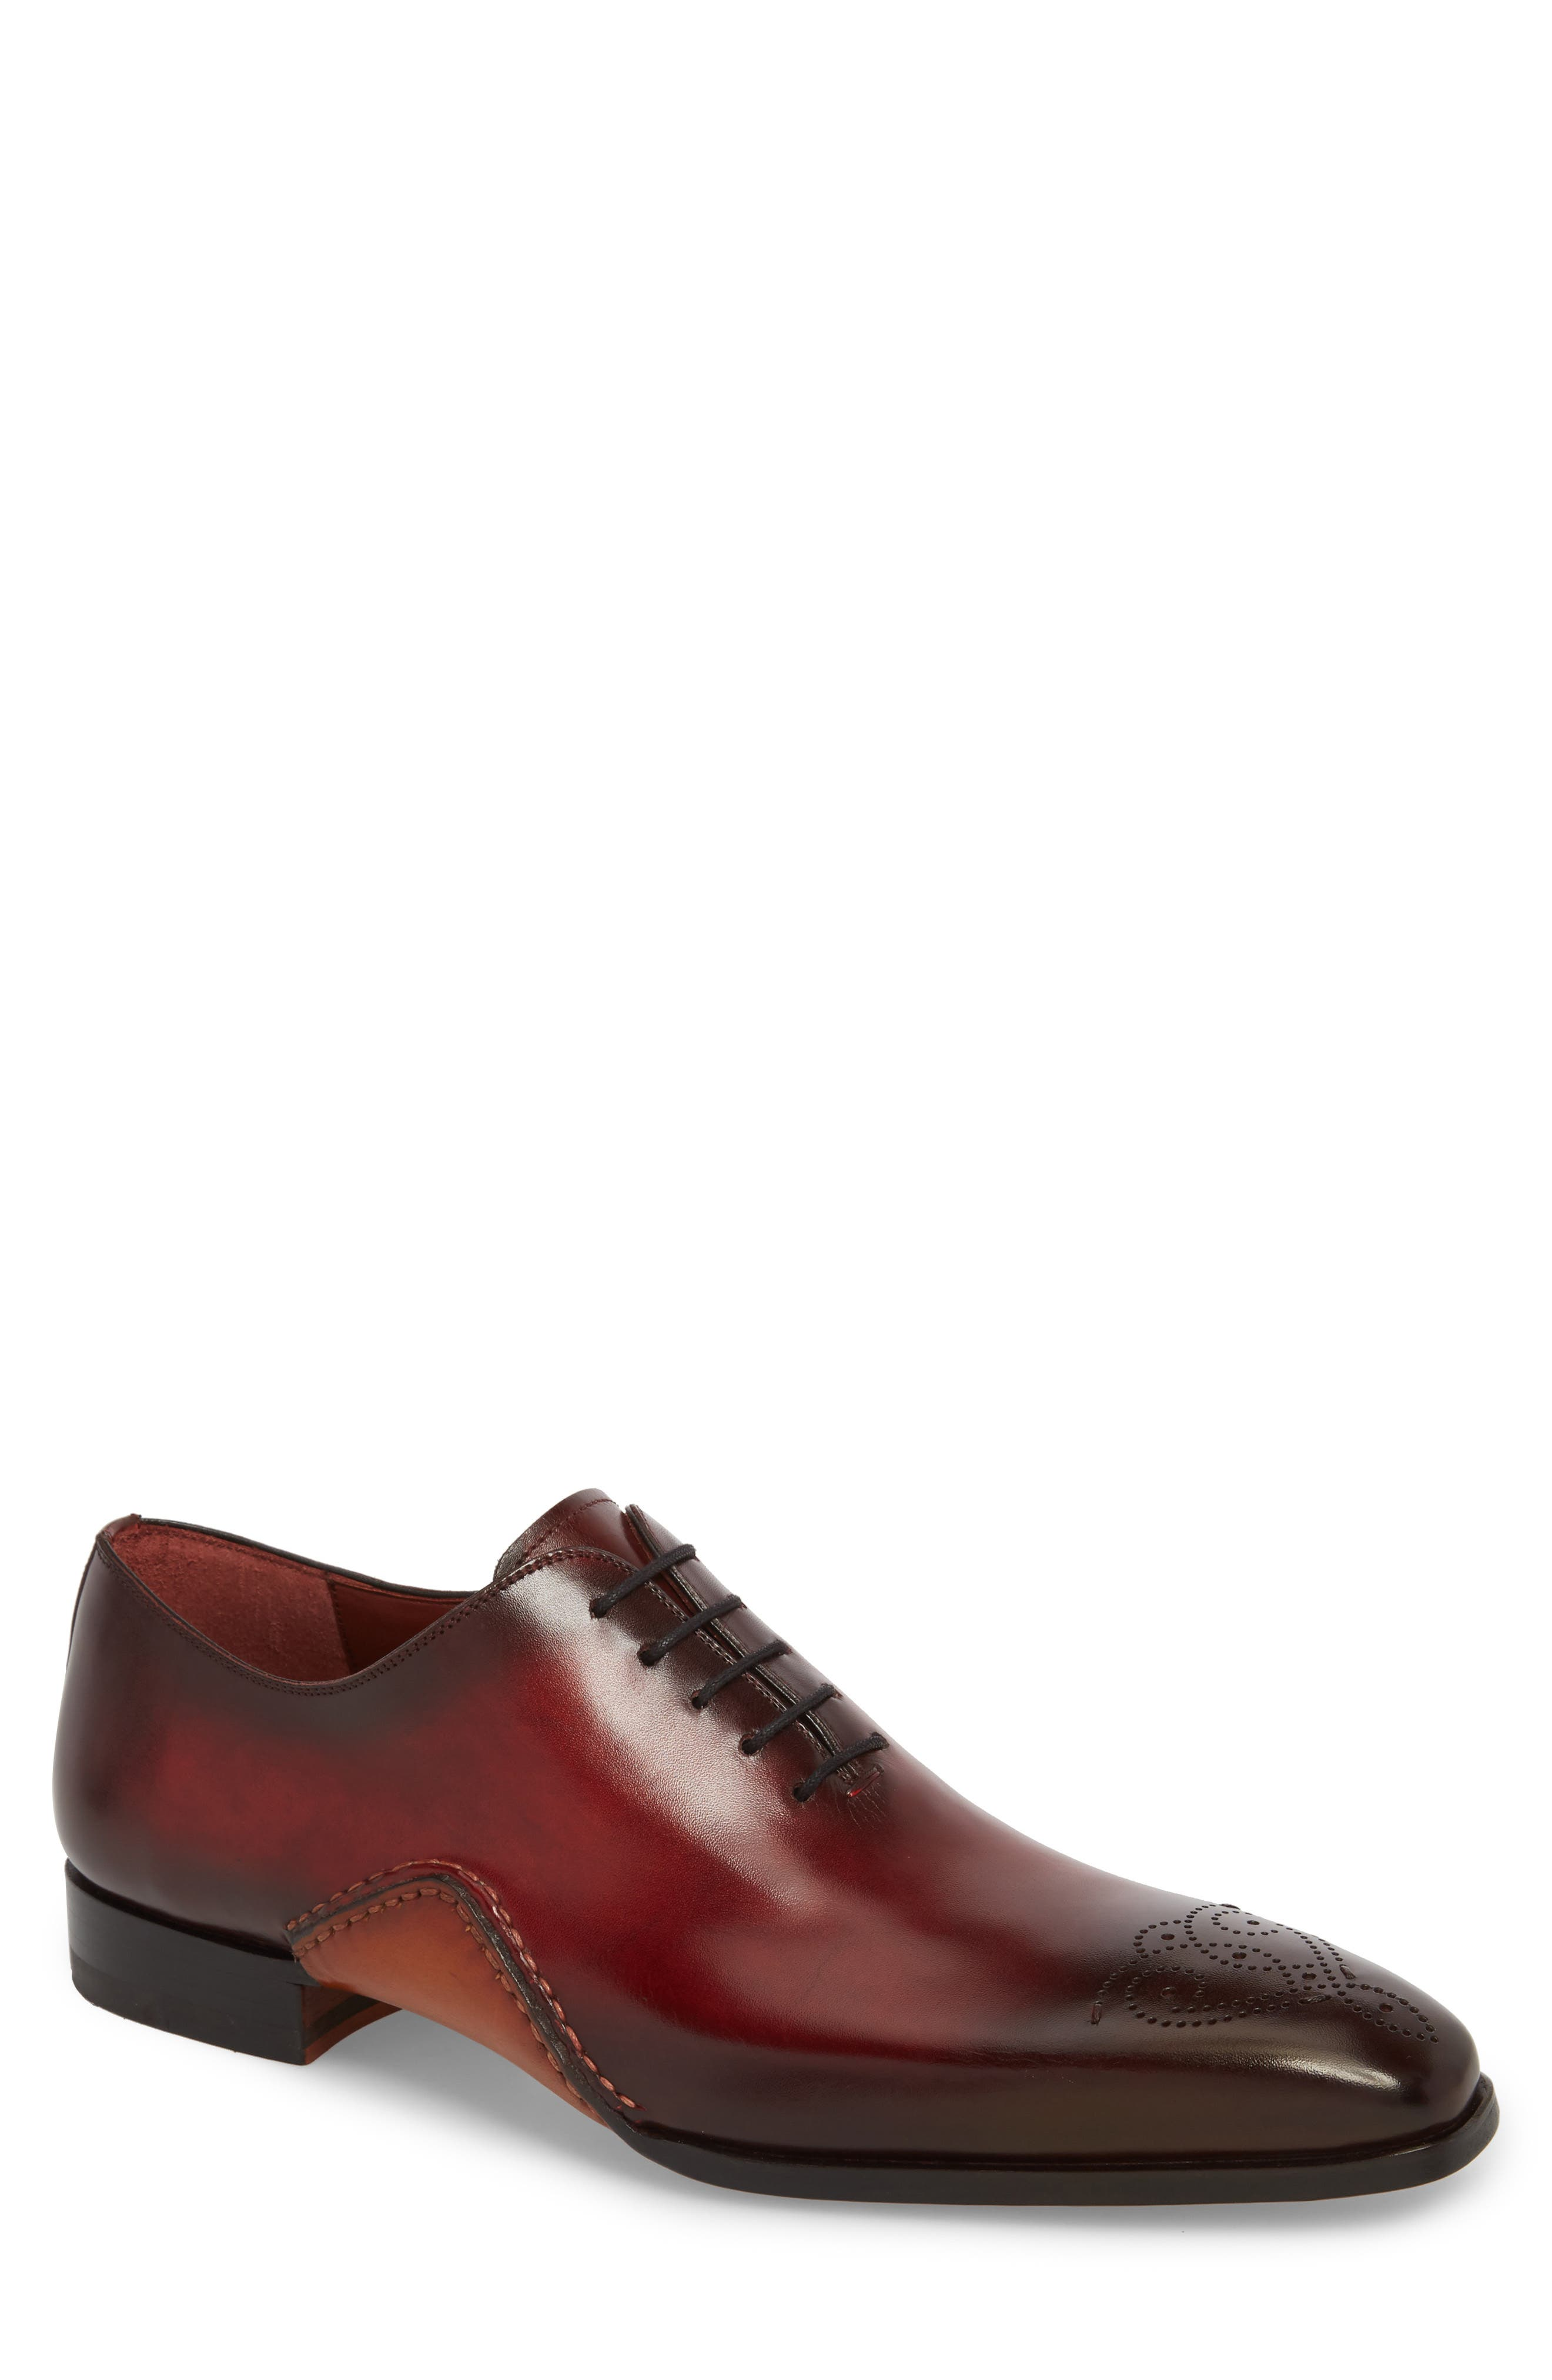 Vada Brogued Whole Cut Shoe,                             Main thumbnail 1, color,                             600